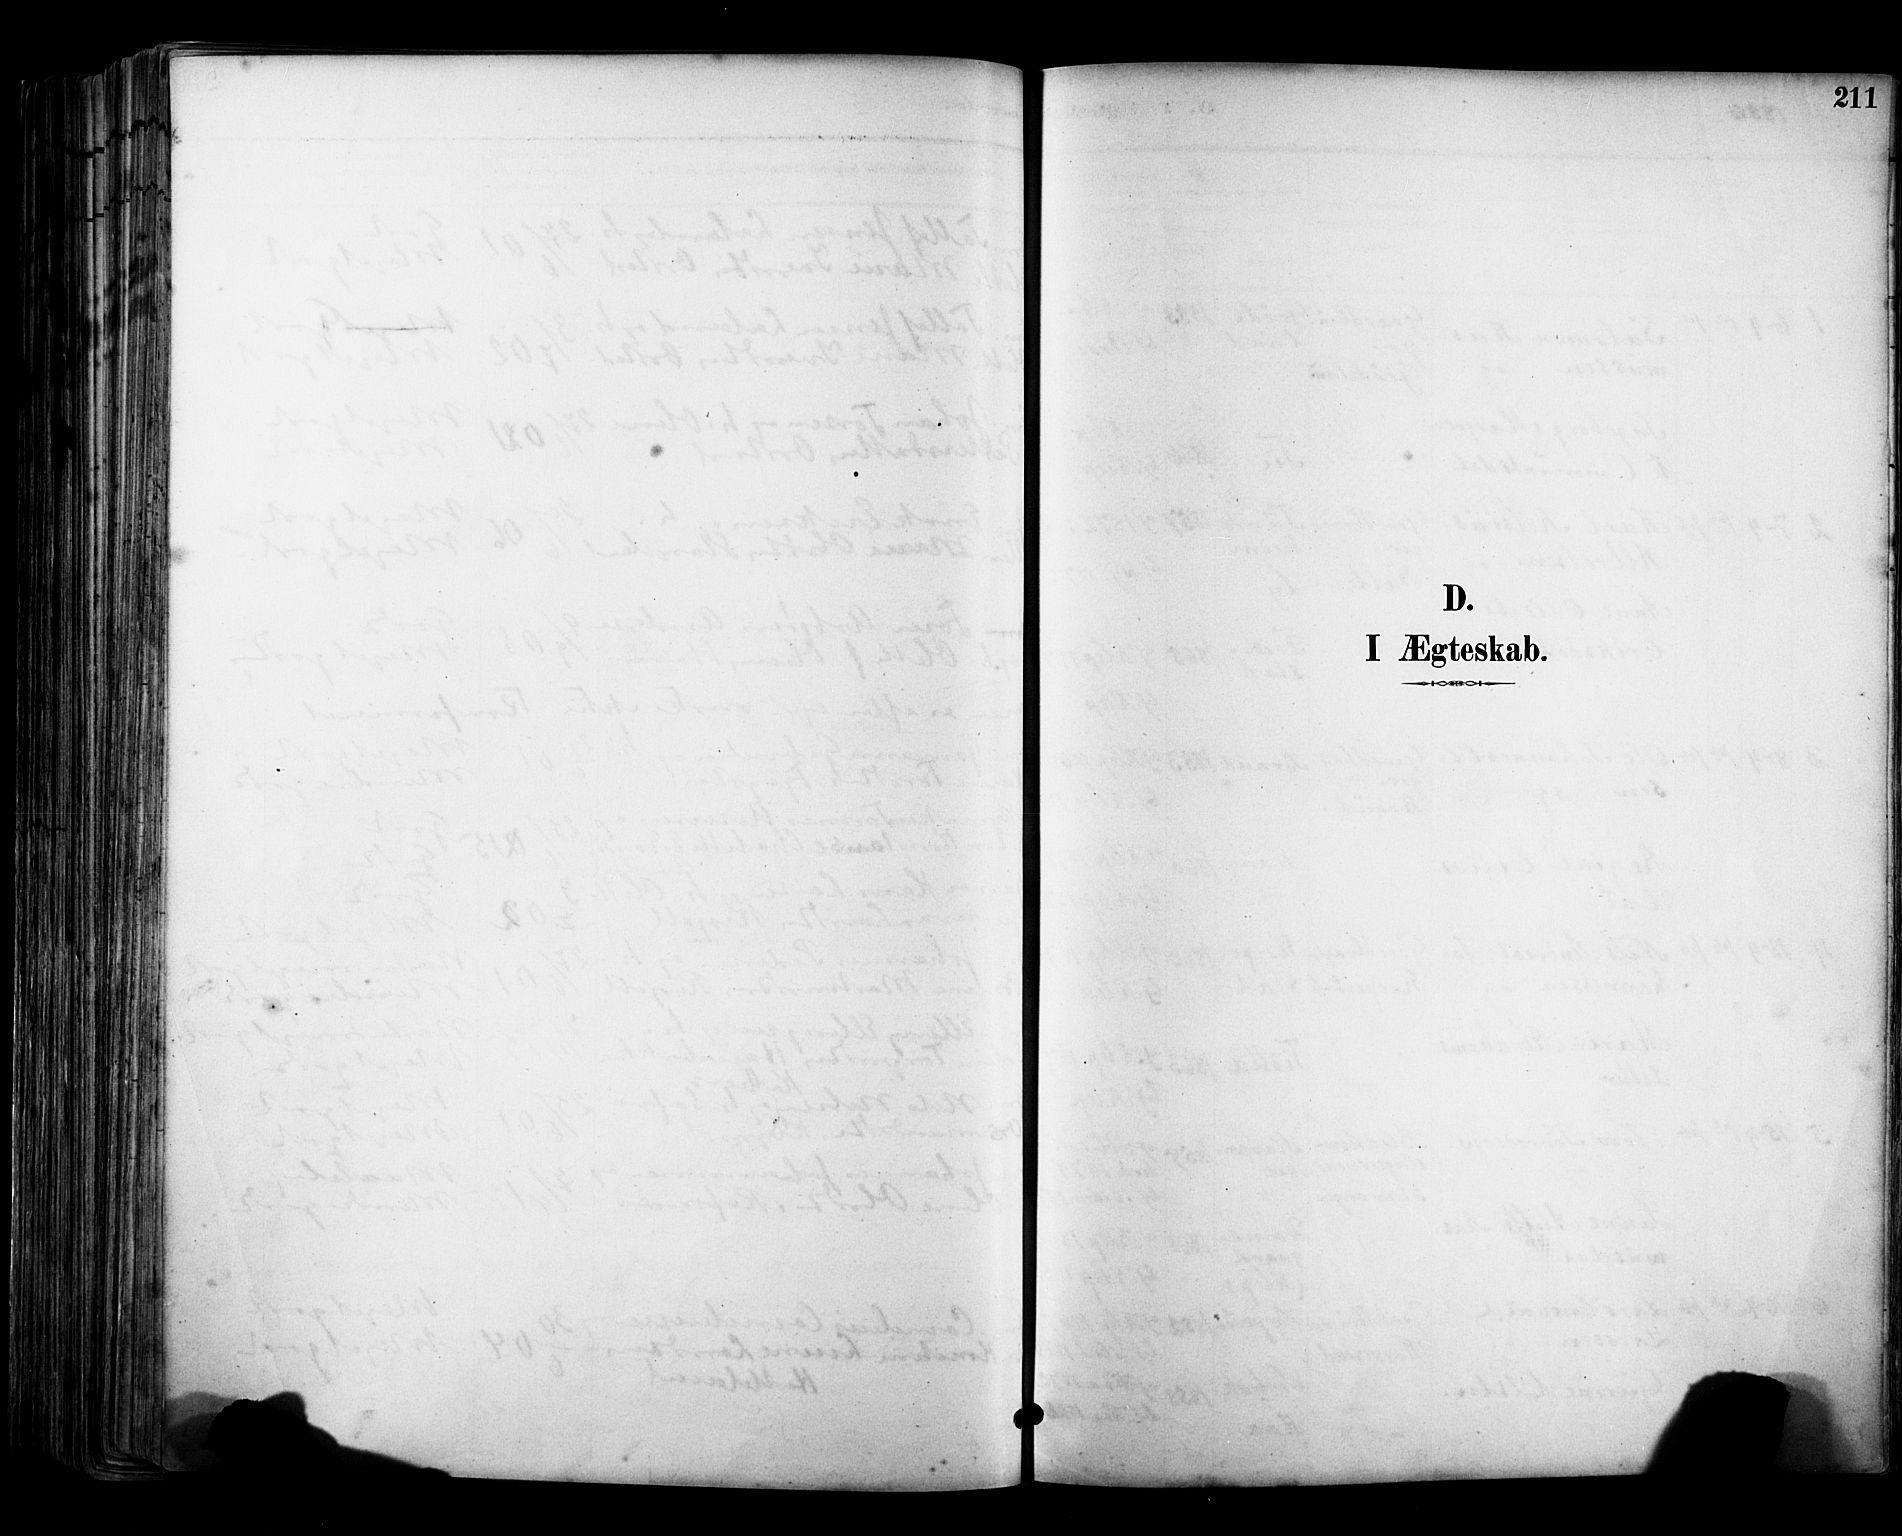 SAST, Klepp sokneprestkontor, 30BA/L0009: Ministerialbok nr. A 7, 1886-1915, s. 211